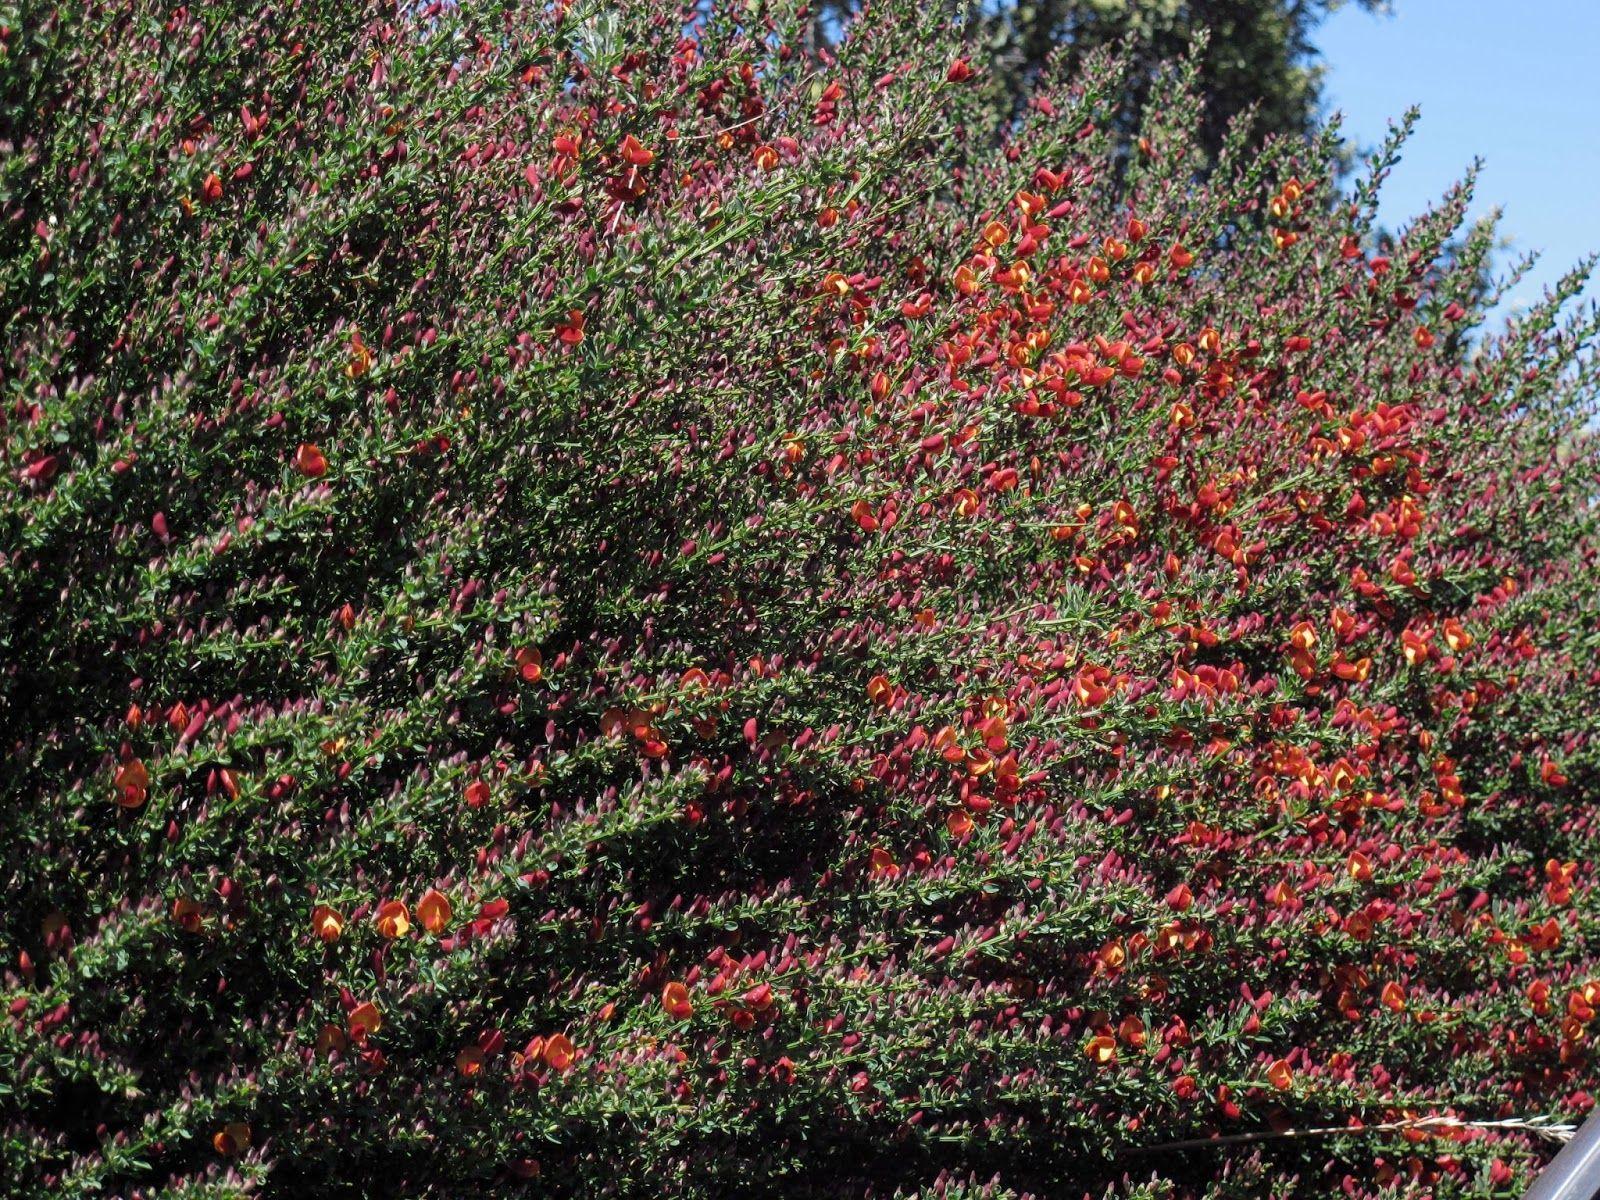 En el jardin viveros retama roja plantas pinterest for Vivero el jardin